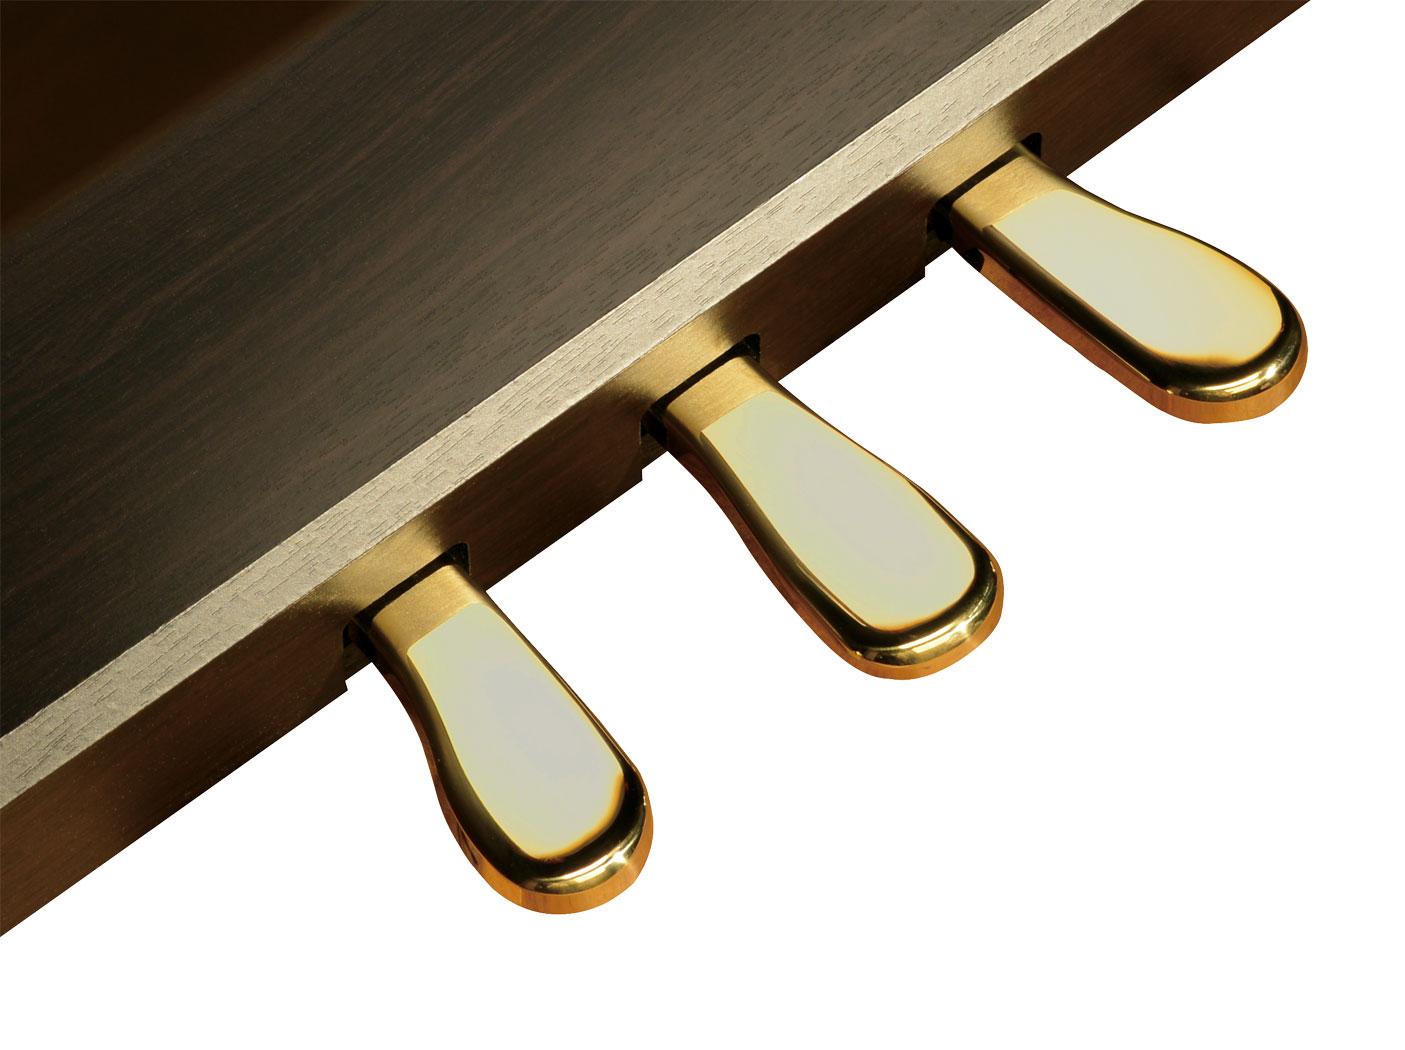 roland india rp401r digital piano. Black Bedroom Furniture Sets. Home Design Ideas